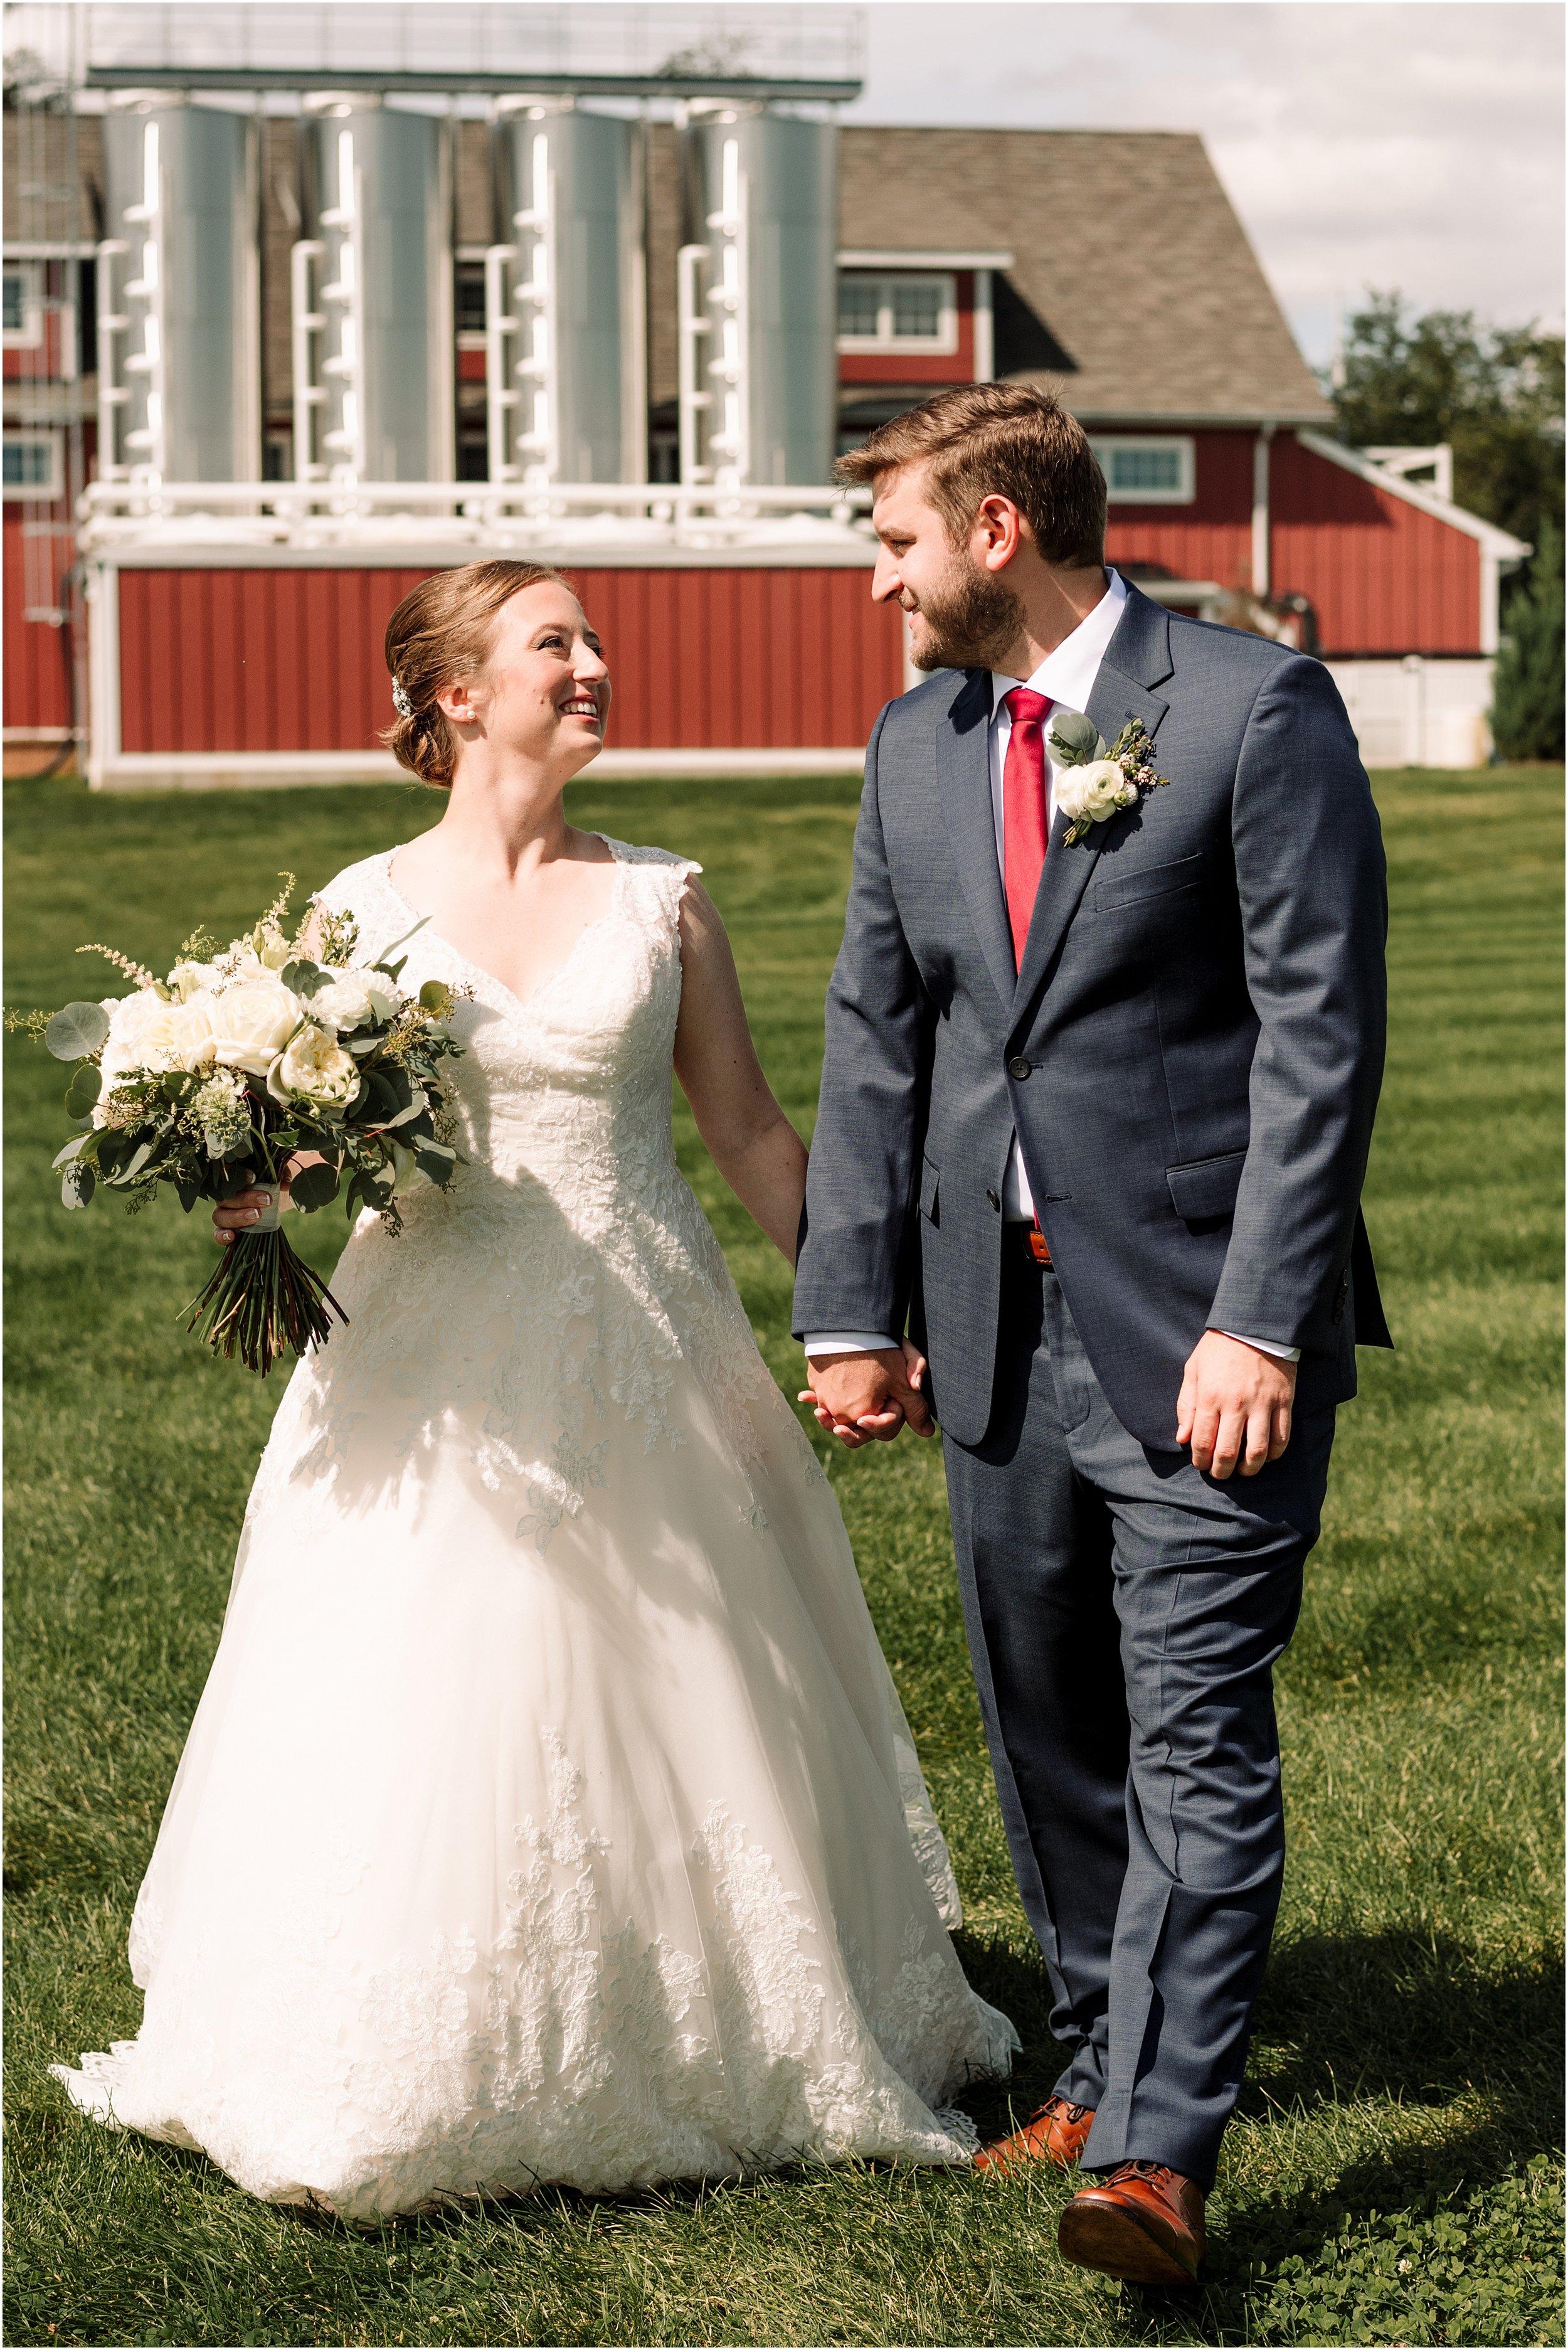 hannah leigh photography Wyndridge Farm Wedding York PA_1508.jpg